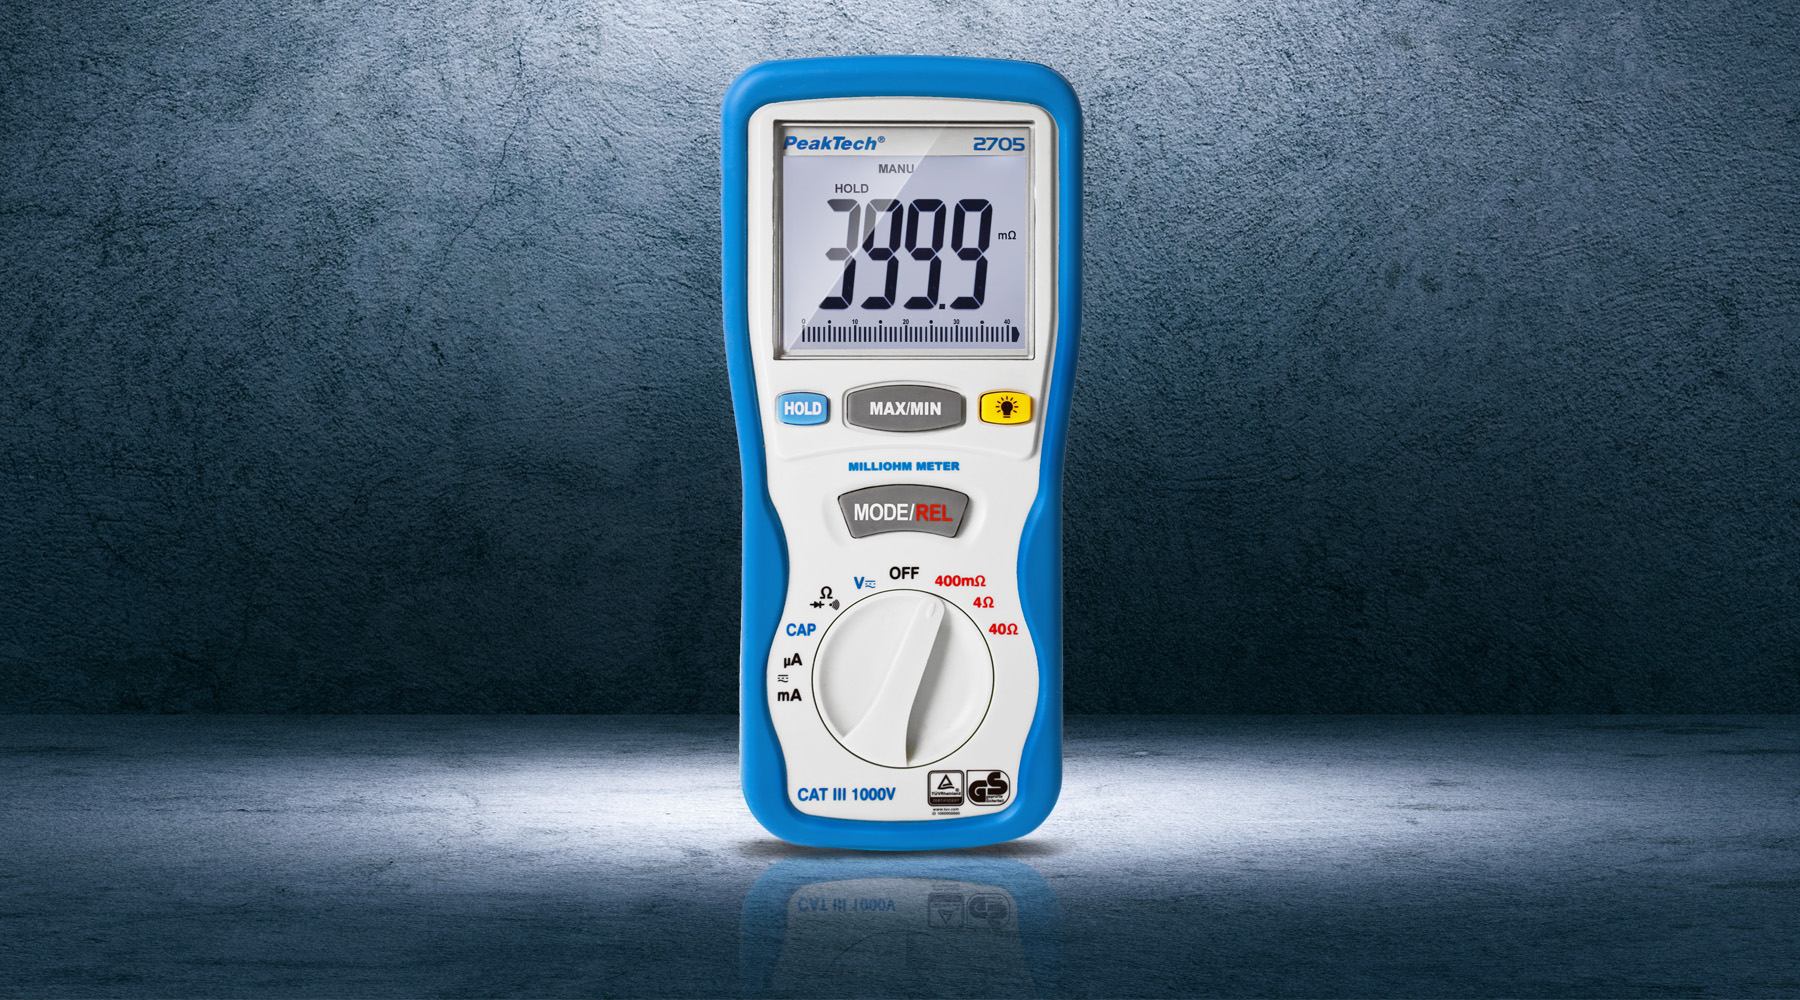 Resistance measuring device according to DIN EN 61557-4 (VDE 0413-4)